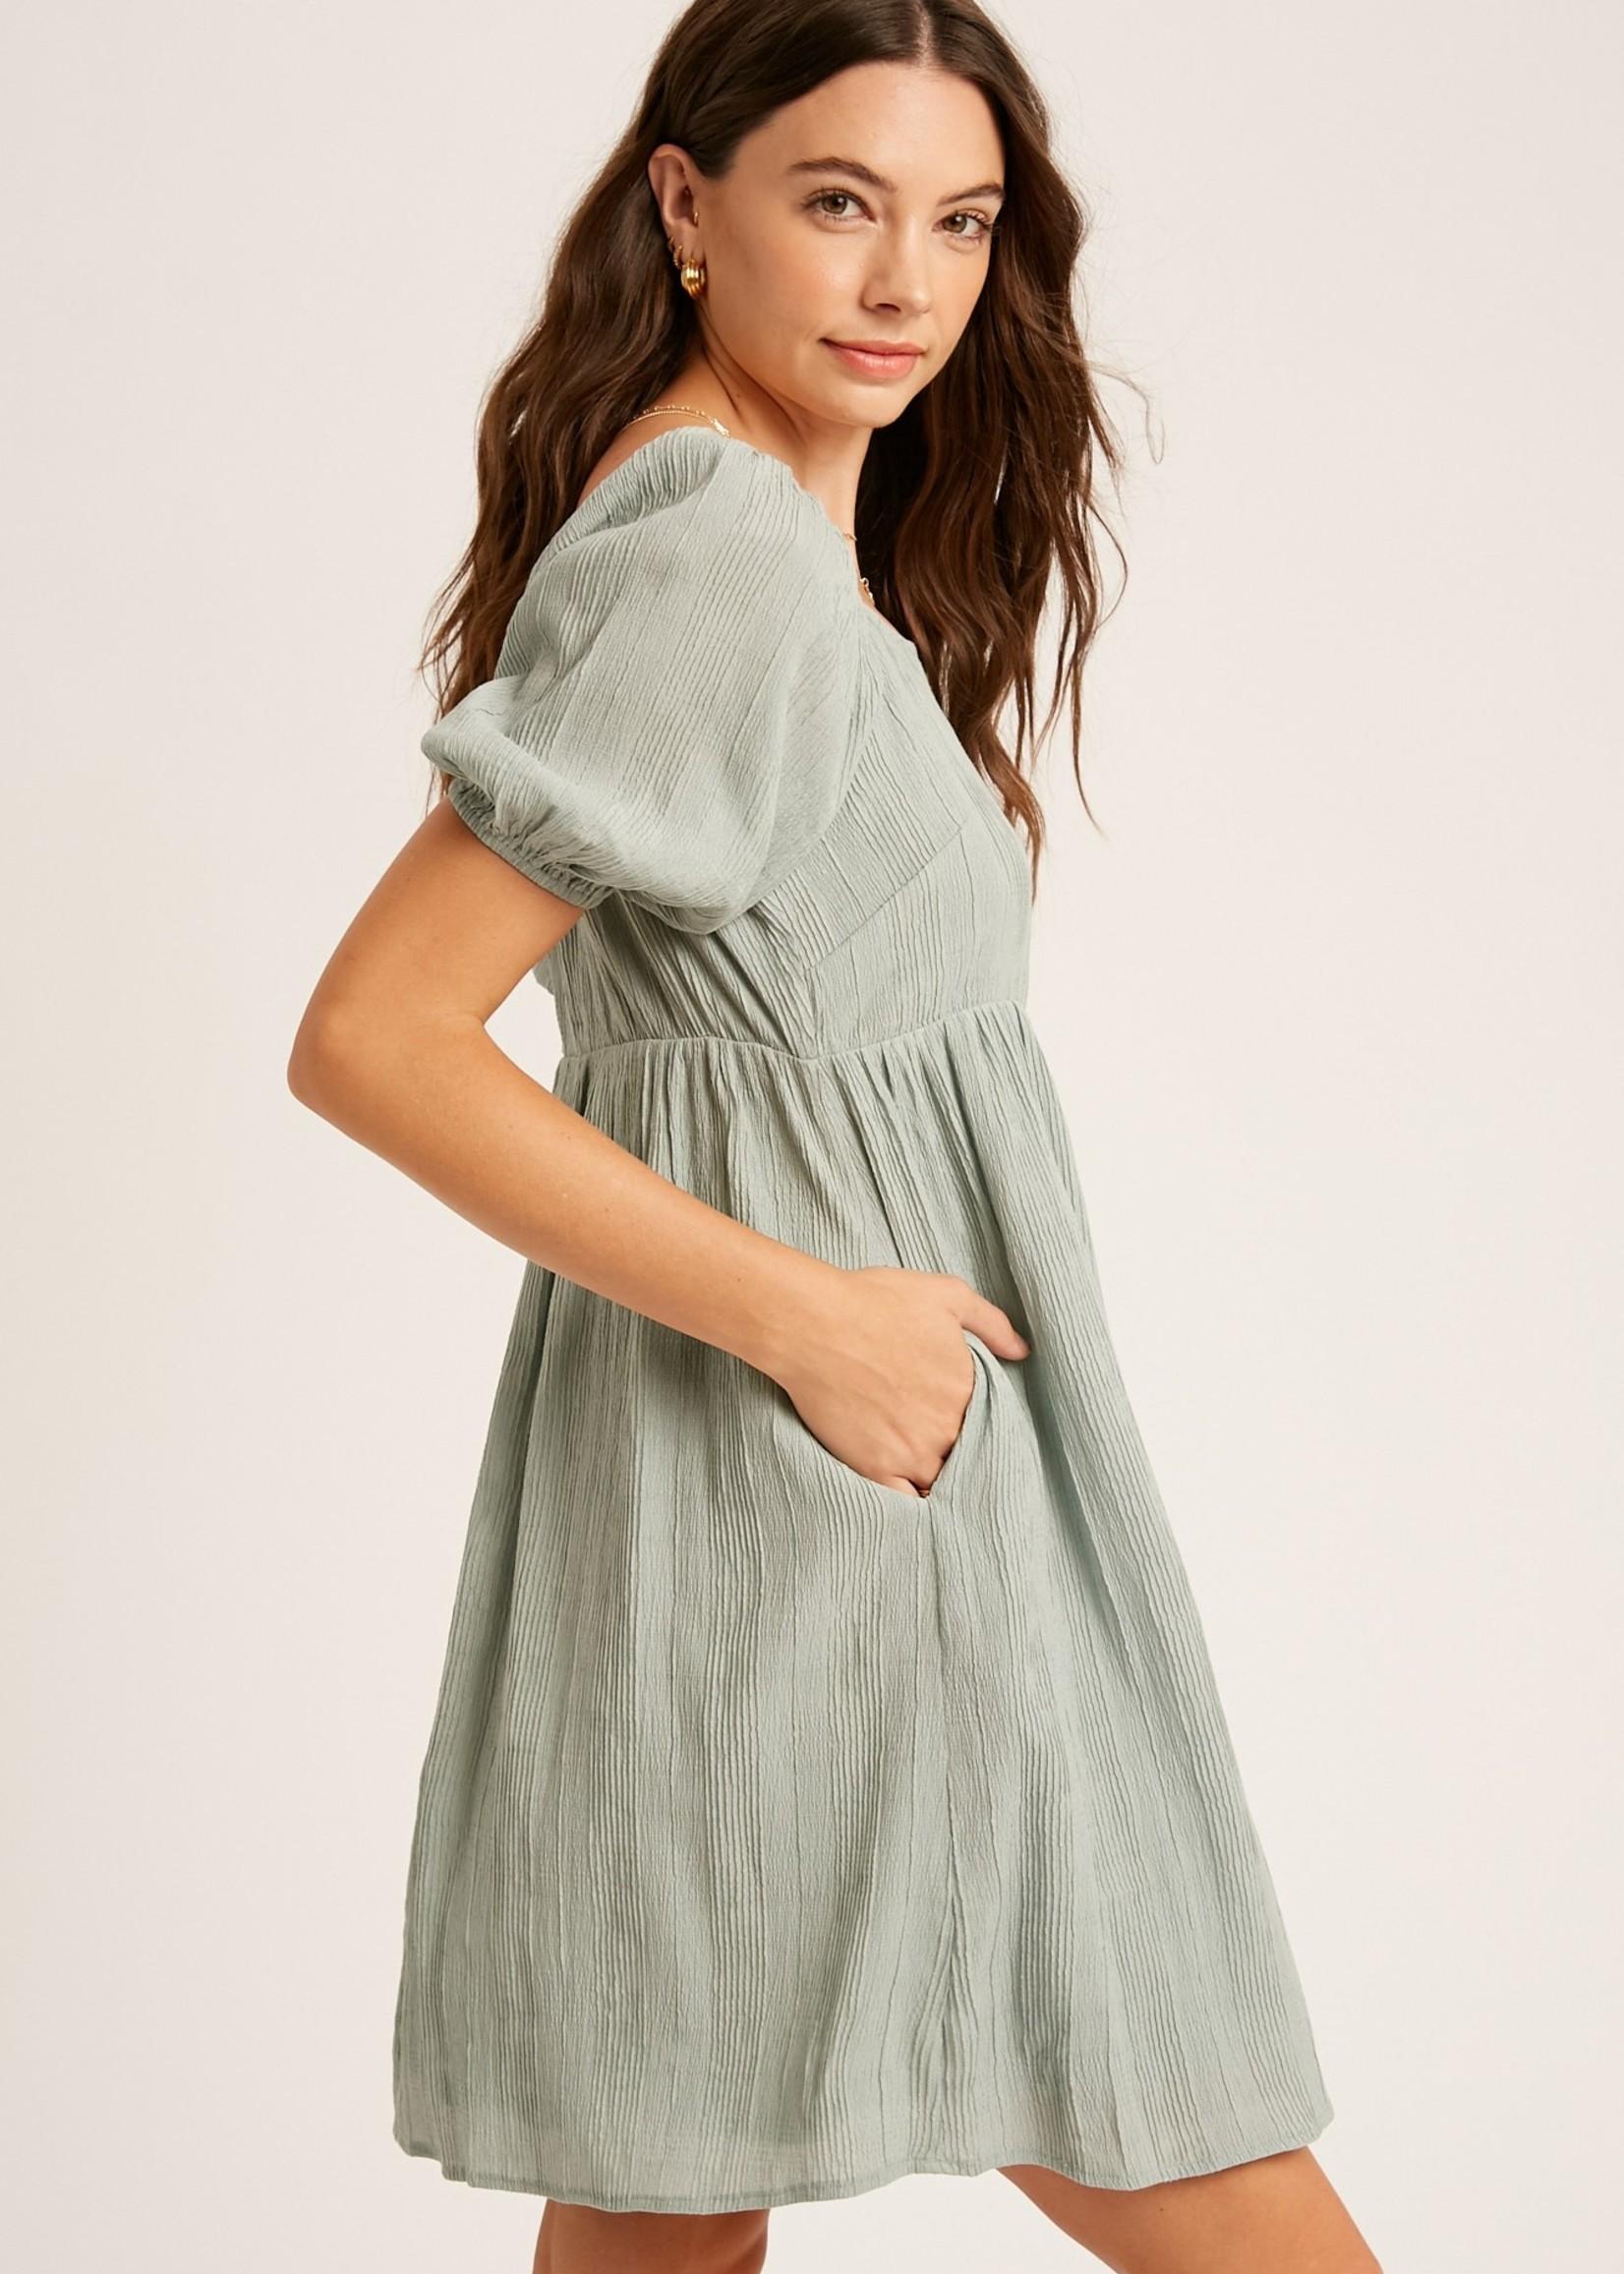 Square Neck Puff Sleeve Dress - Sage